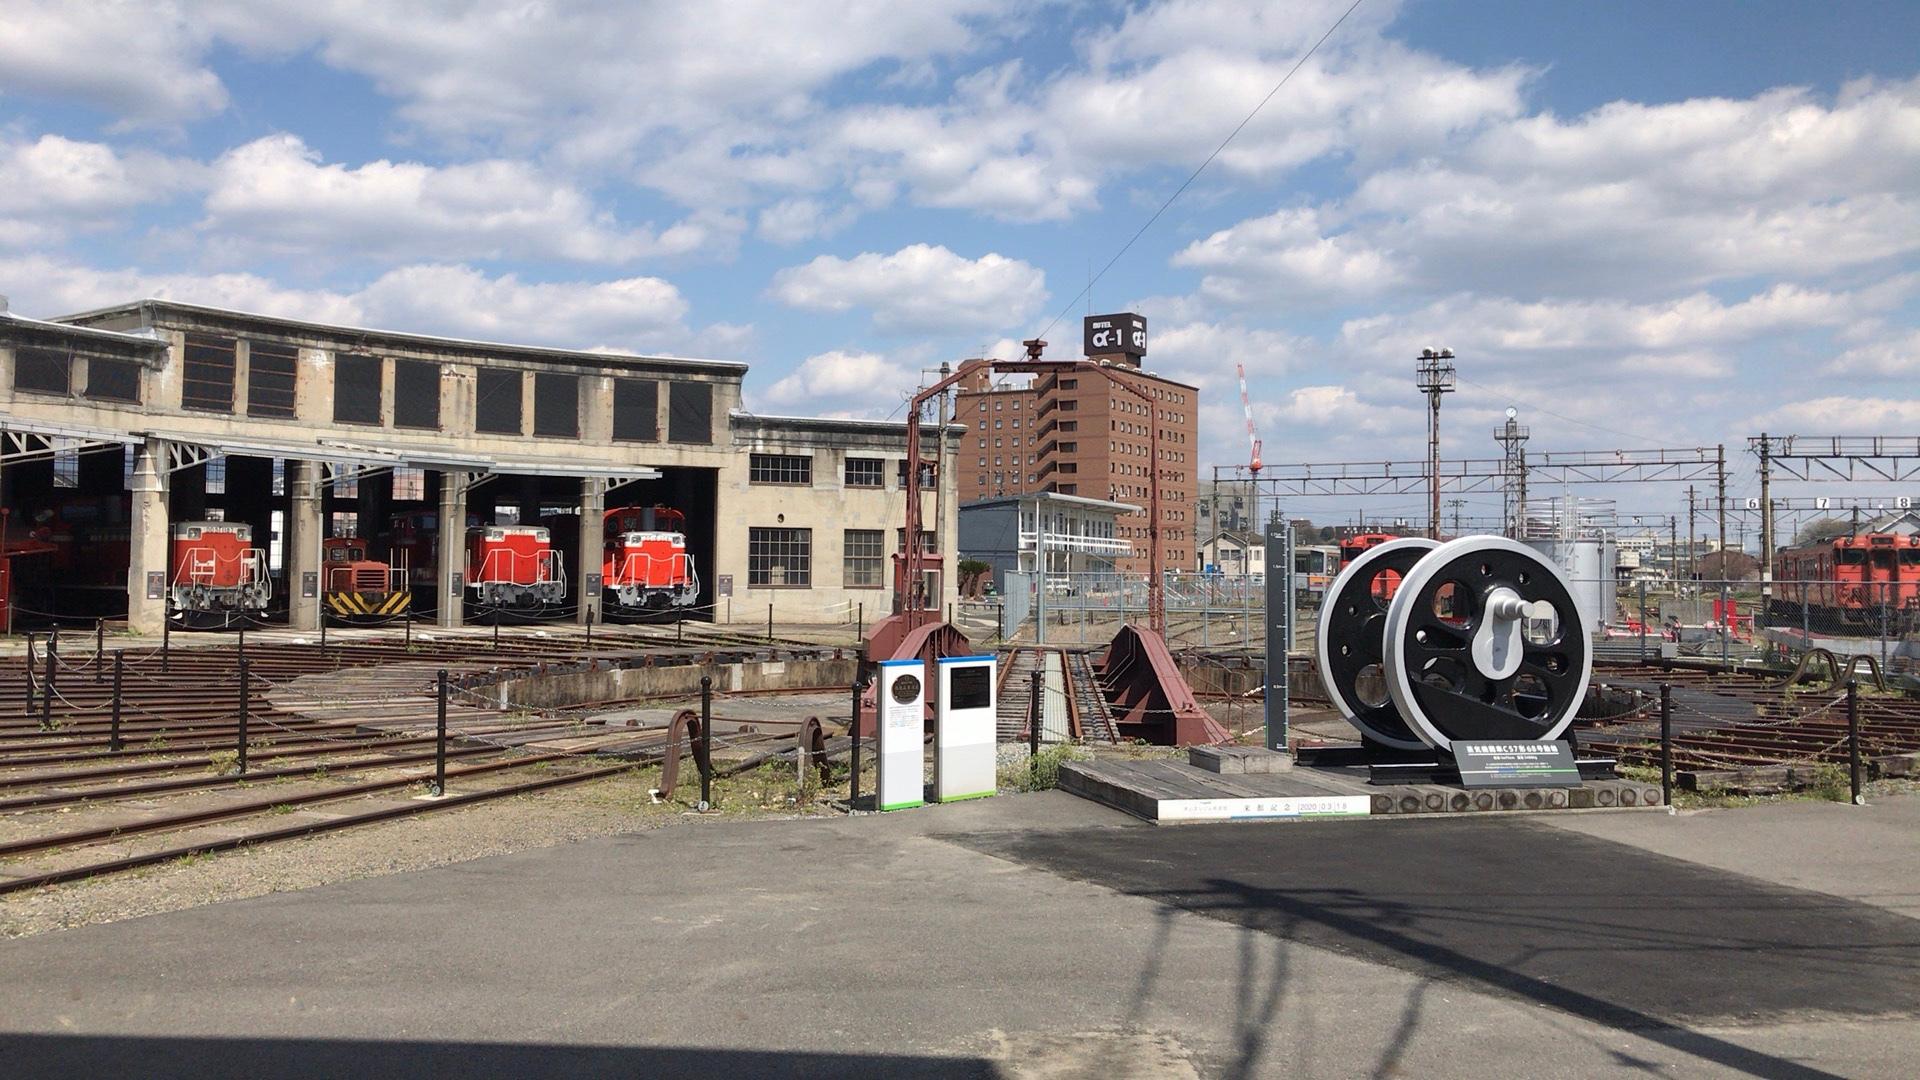 WelcomeBoardの日付が止まったままの鉄道館は来る28日に再開します。